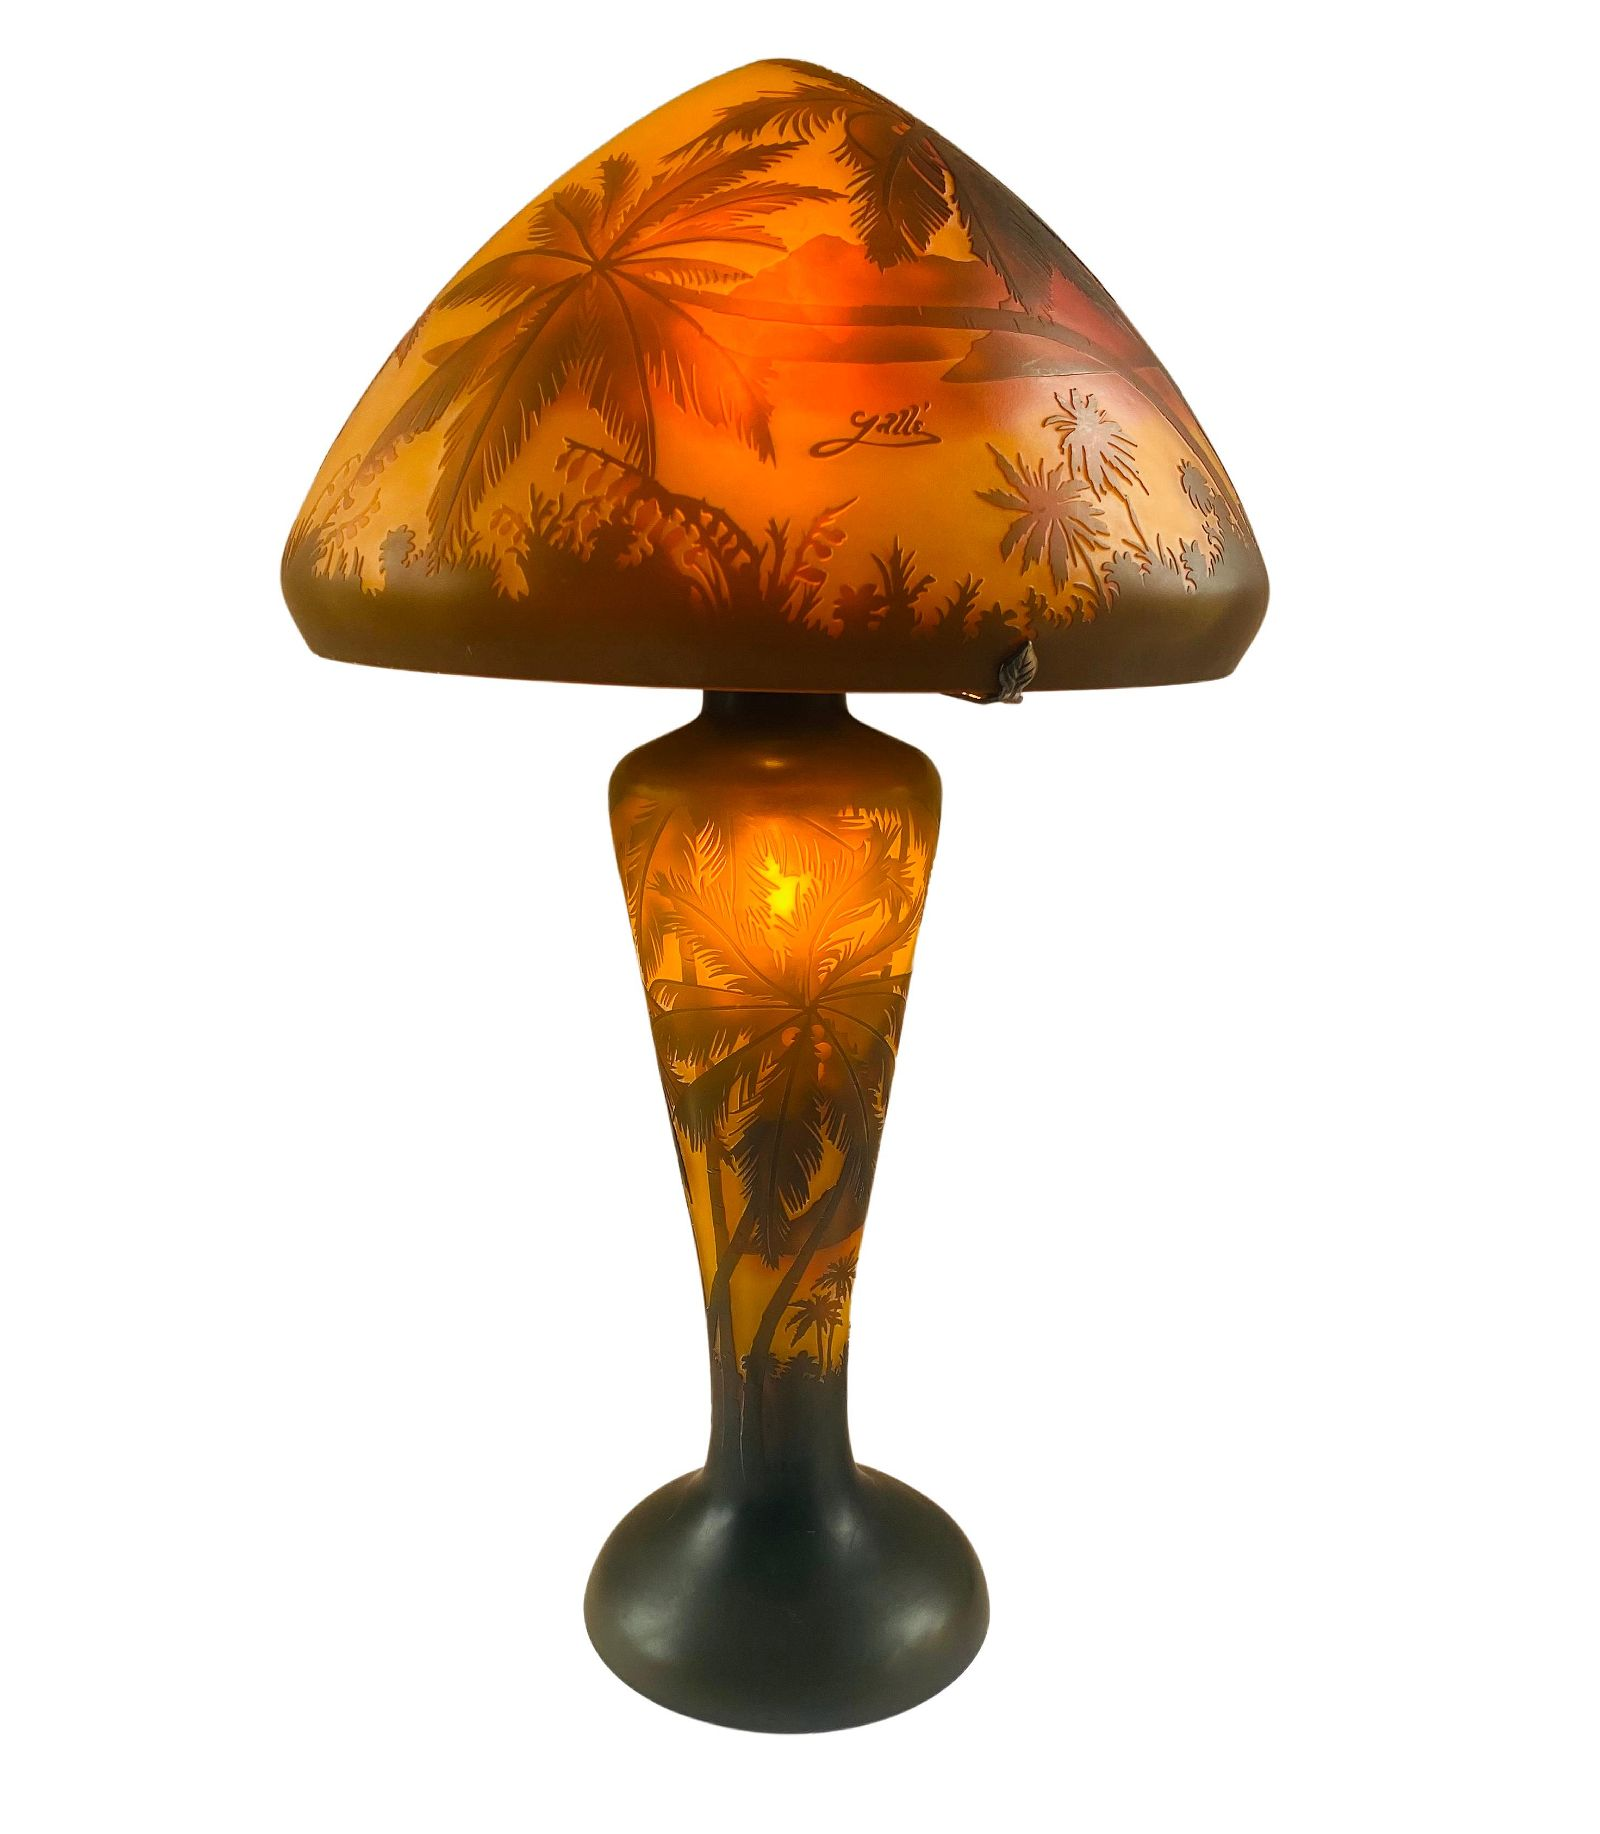 Art Nouveau Style Table Lamp   Galle Style